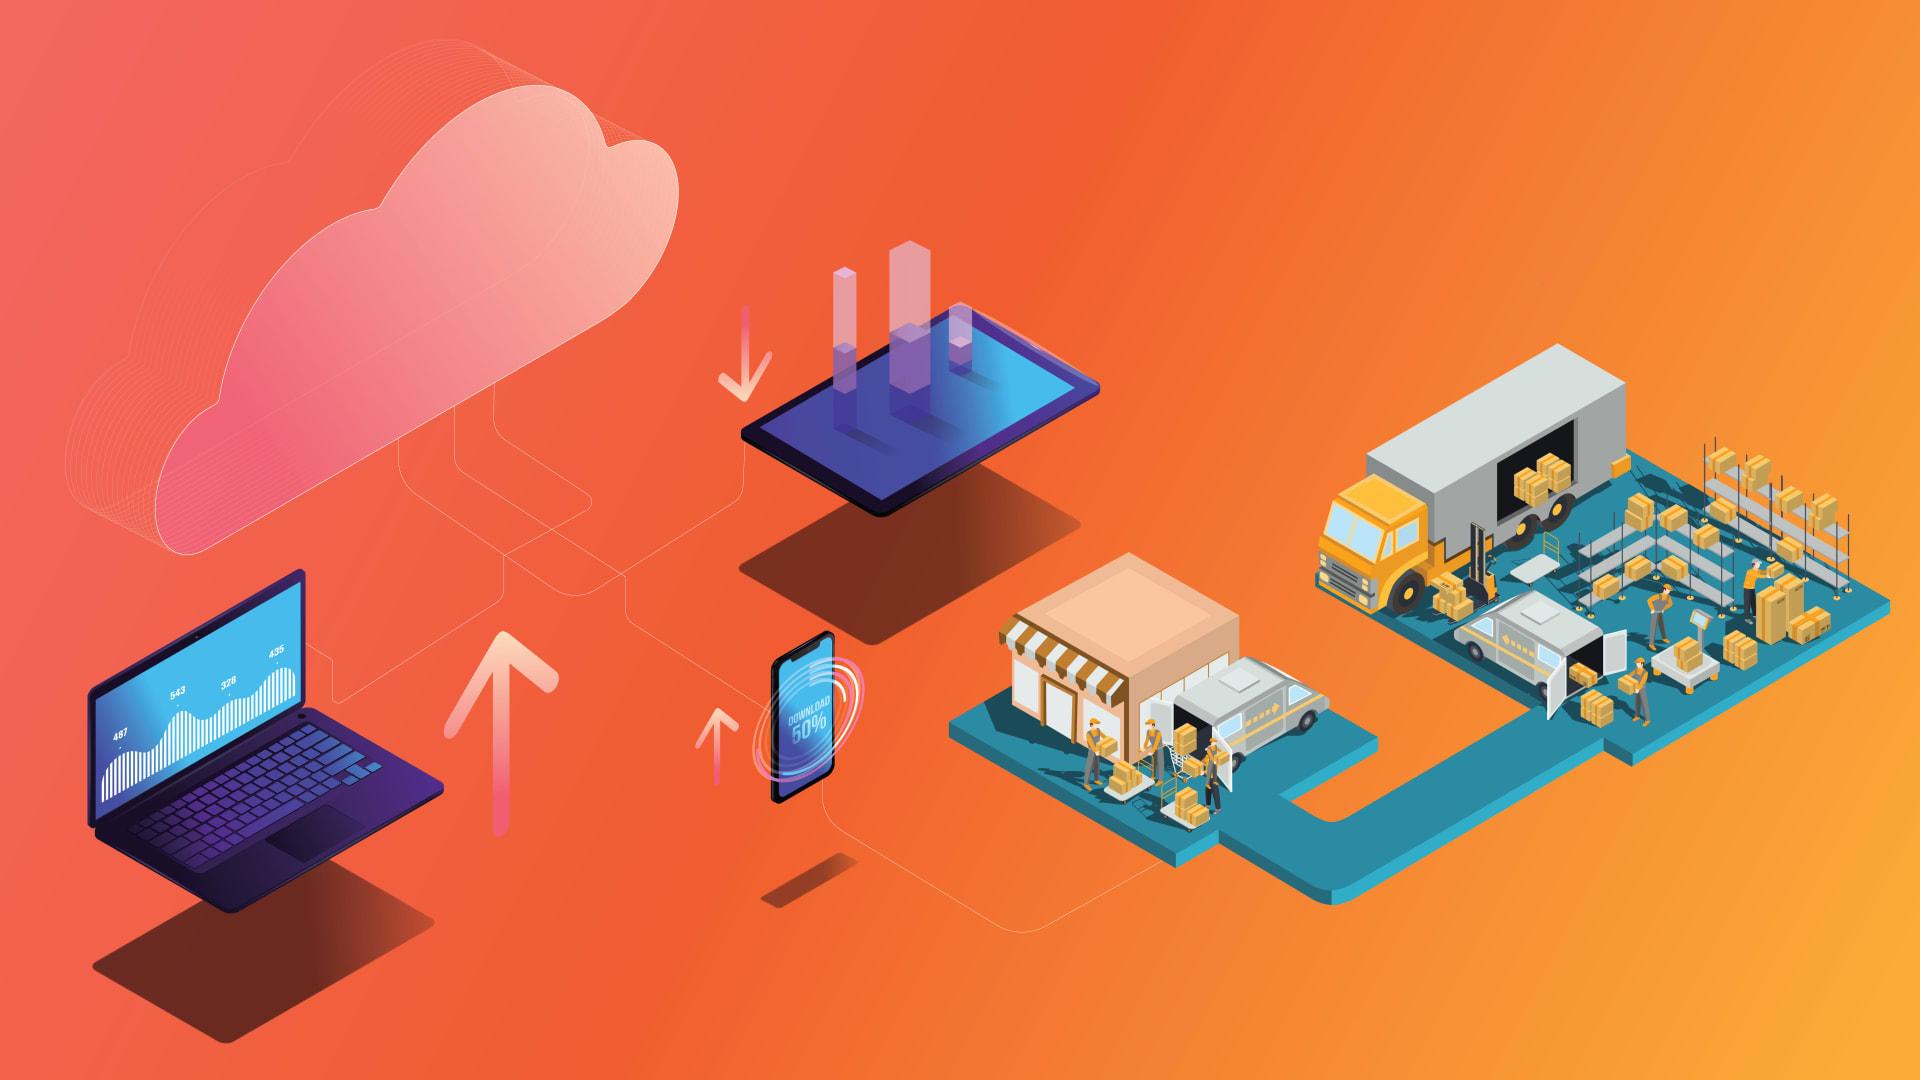 examine digital transformation in supply chain logistics